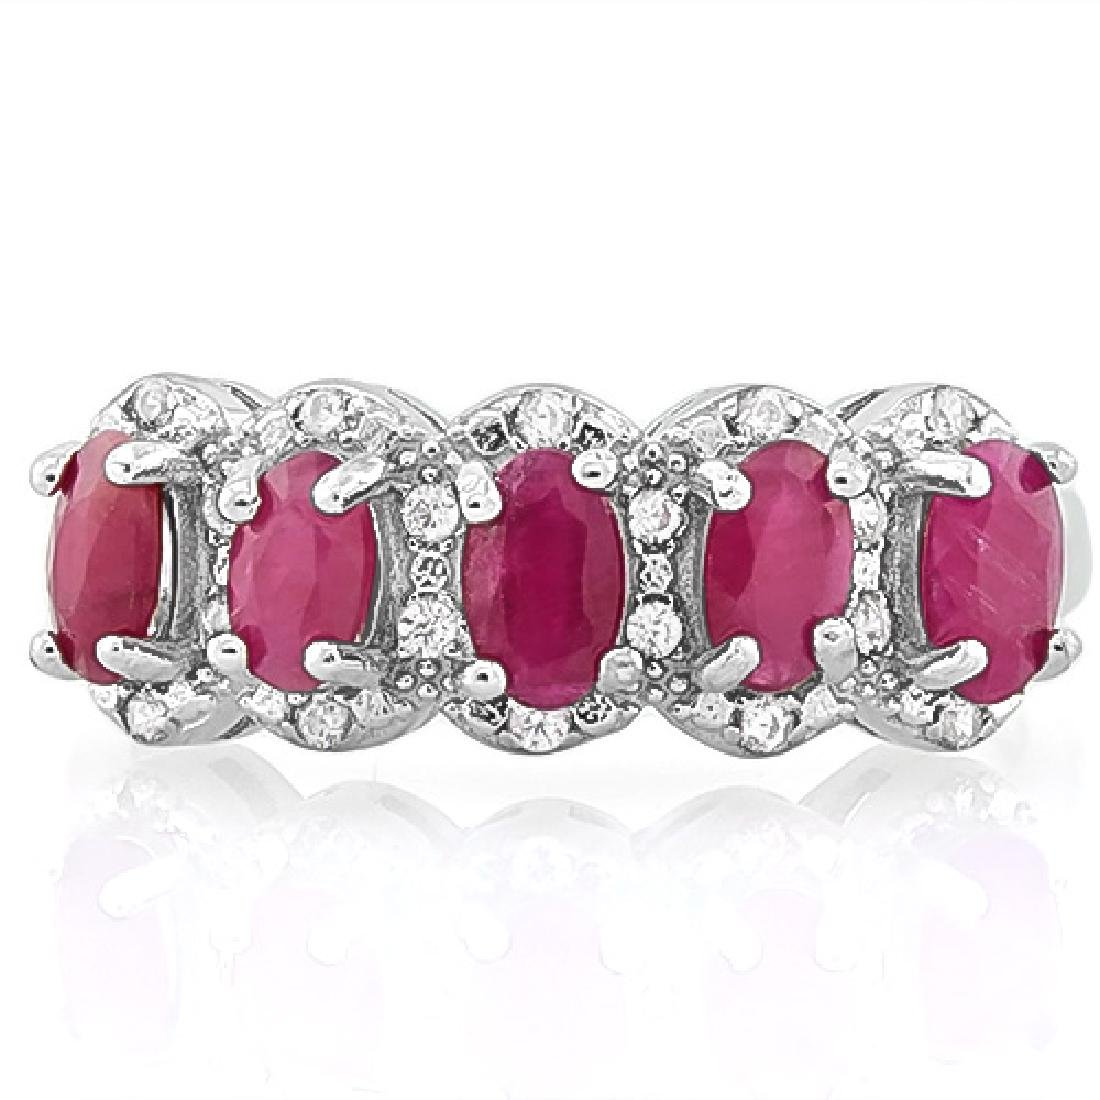 8 1/5 CARAT RUBY & DIAMOND 925 STERLING SILVER RING